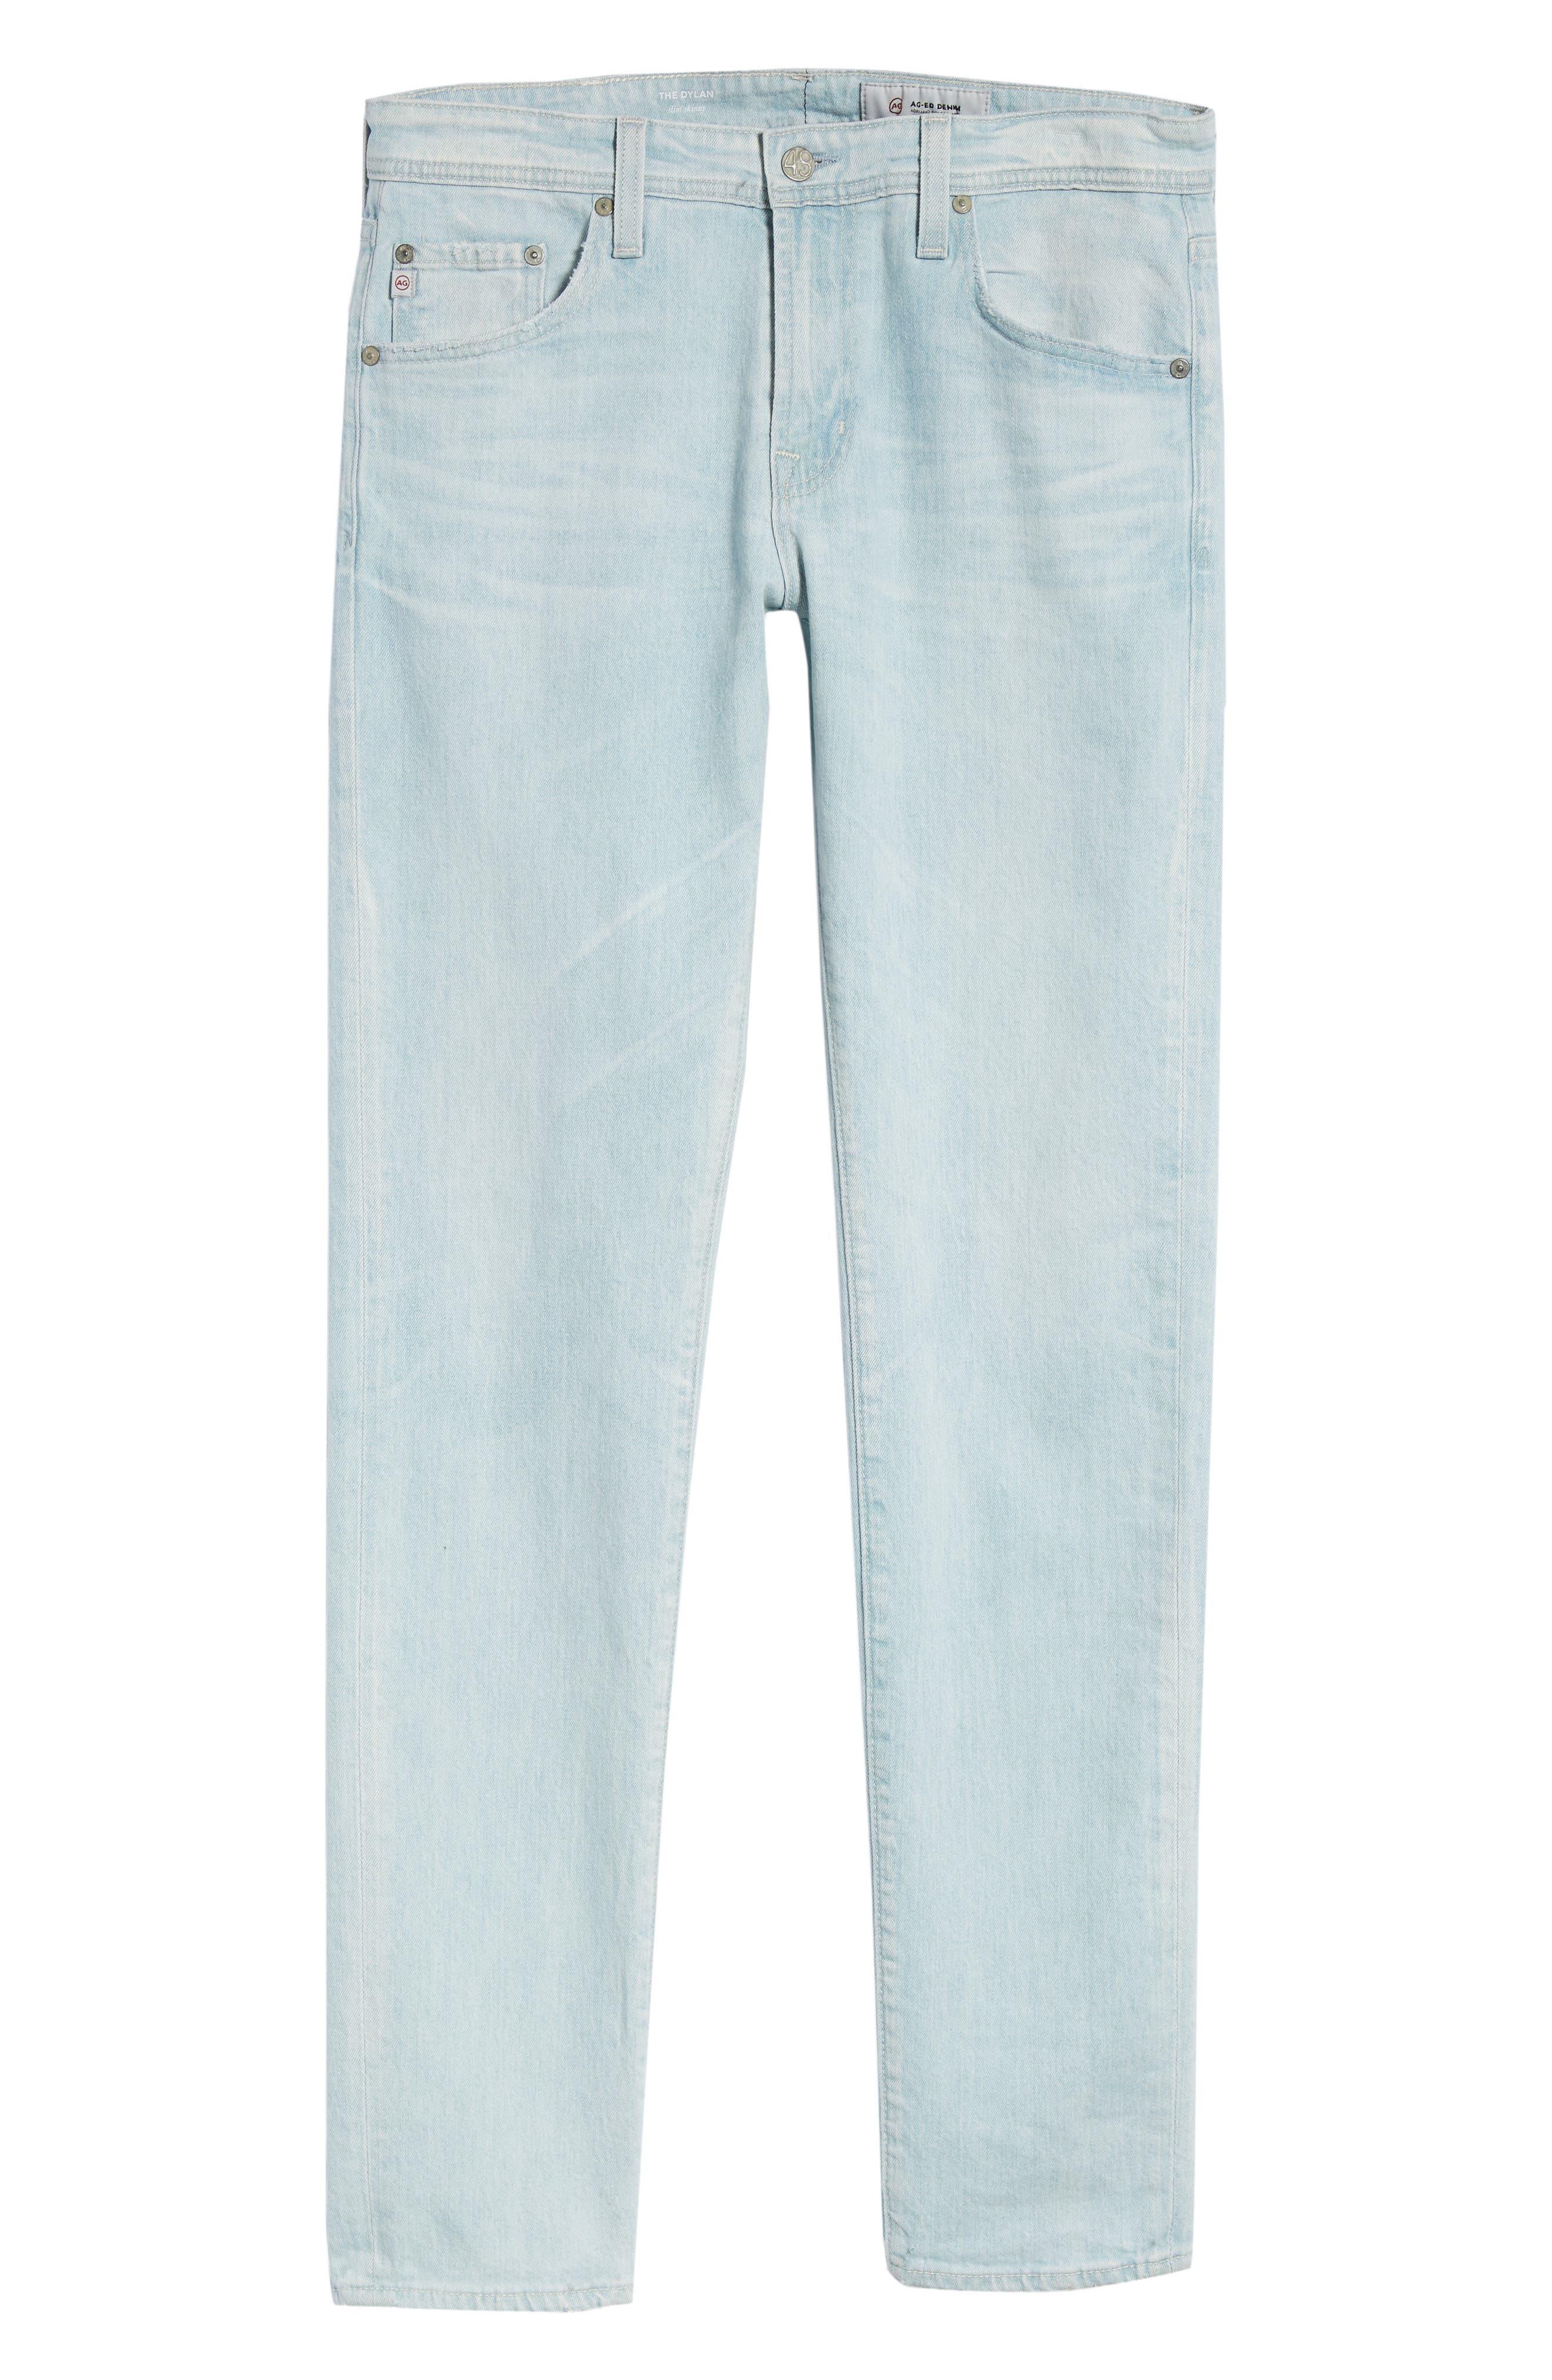 Dylan Skinny Fit Jeans,                             Alternate thumbnail 6, color,                             28 Years Salt Mist